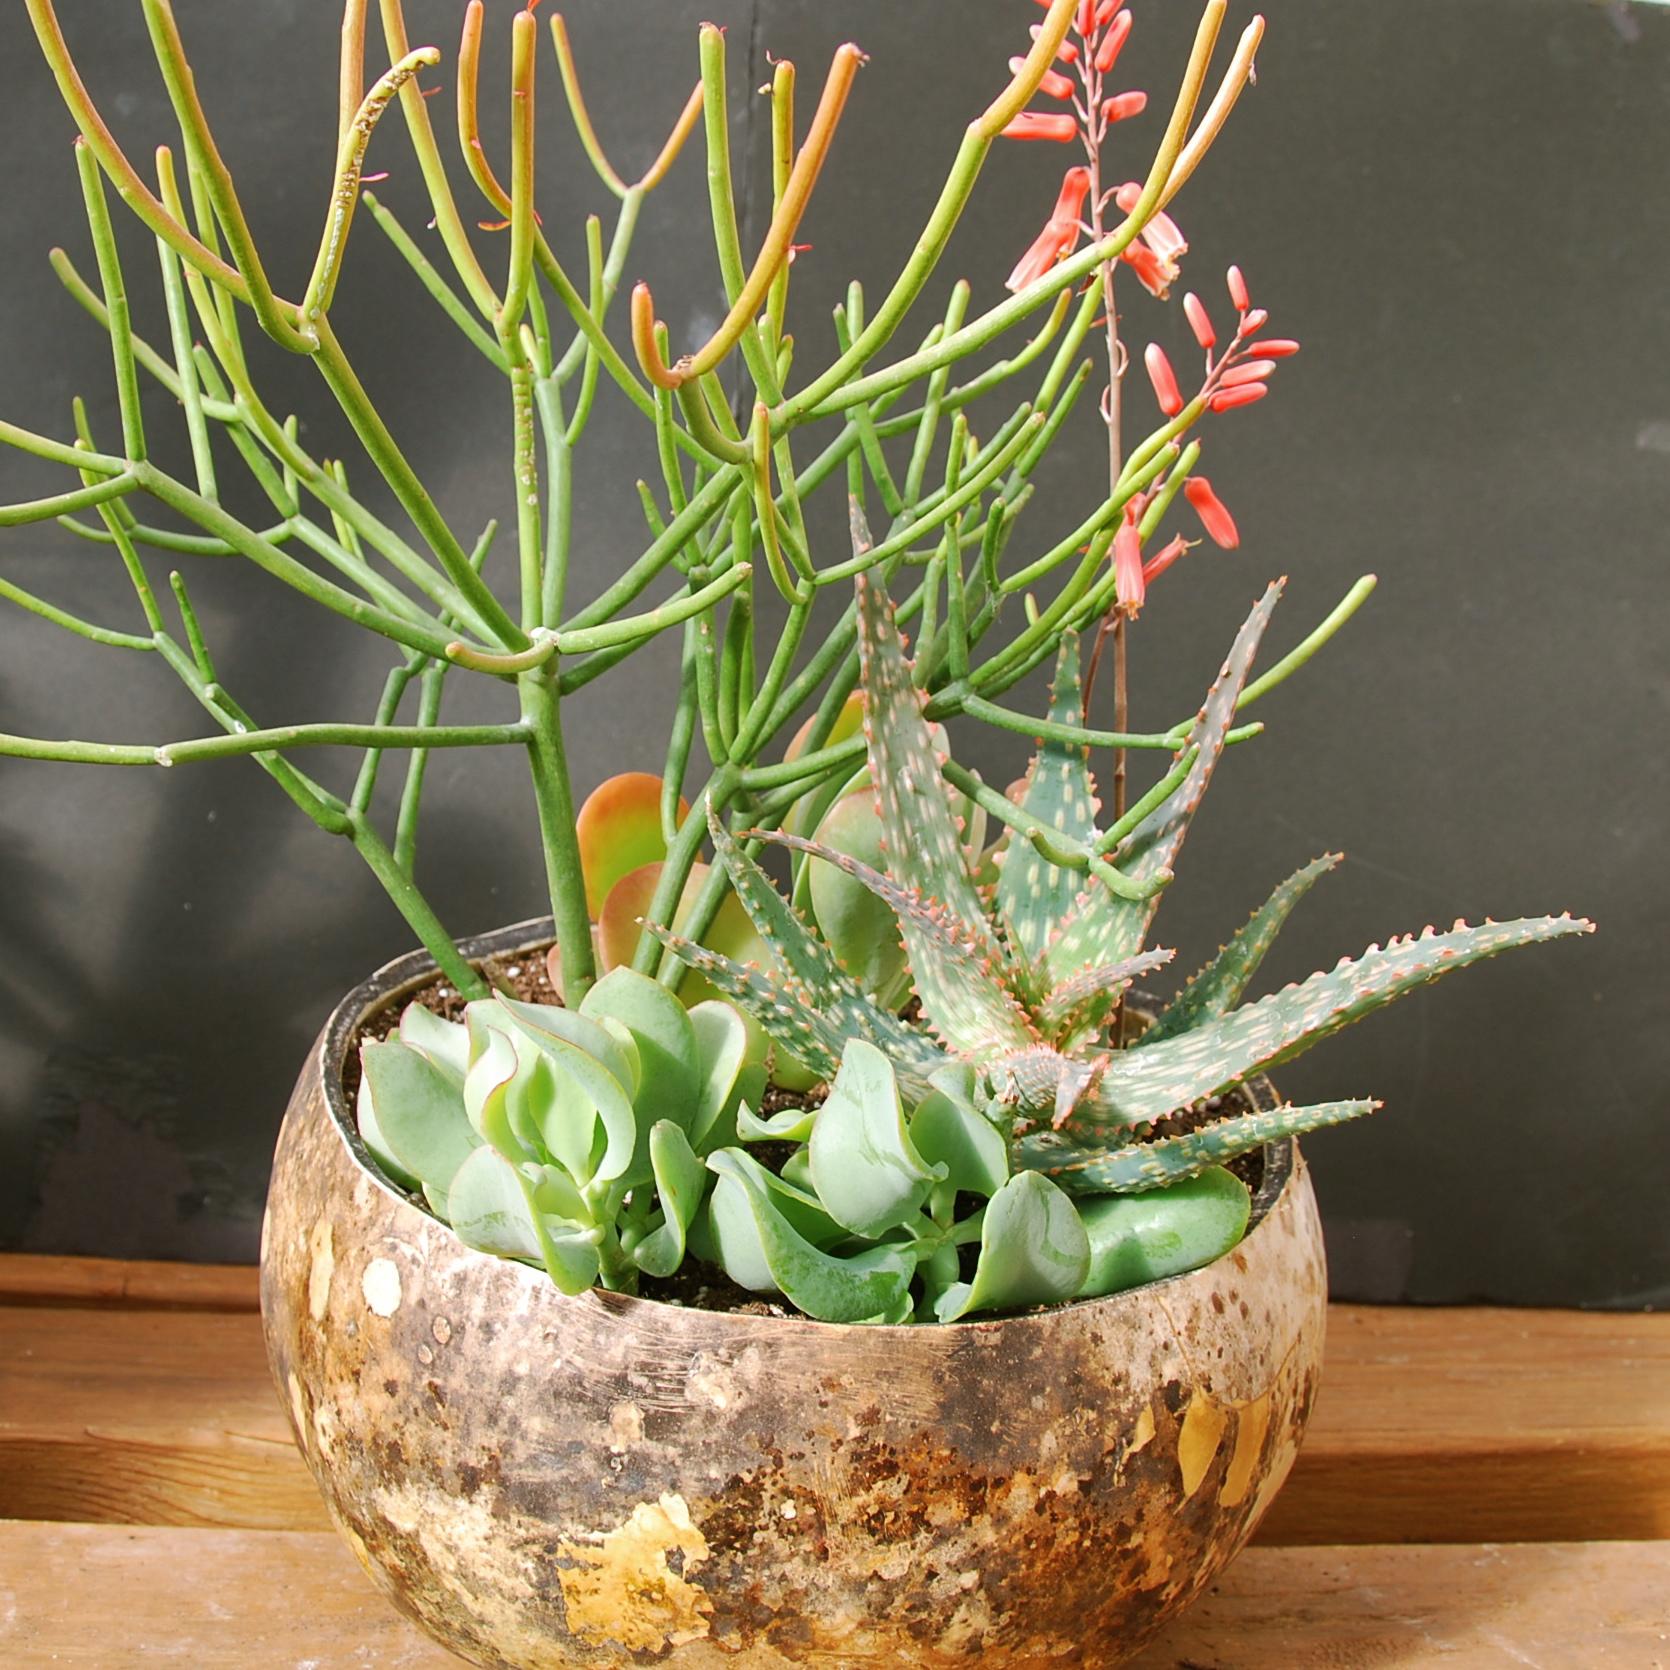 Euphorbia tirucalli 'Firesticks', Aloe 'Campfire', Crassula arborescens 'Ripple Jade' in gourd container